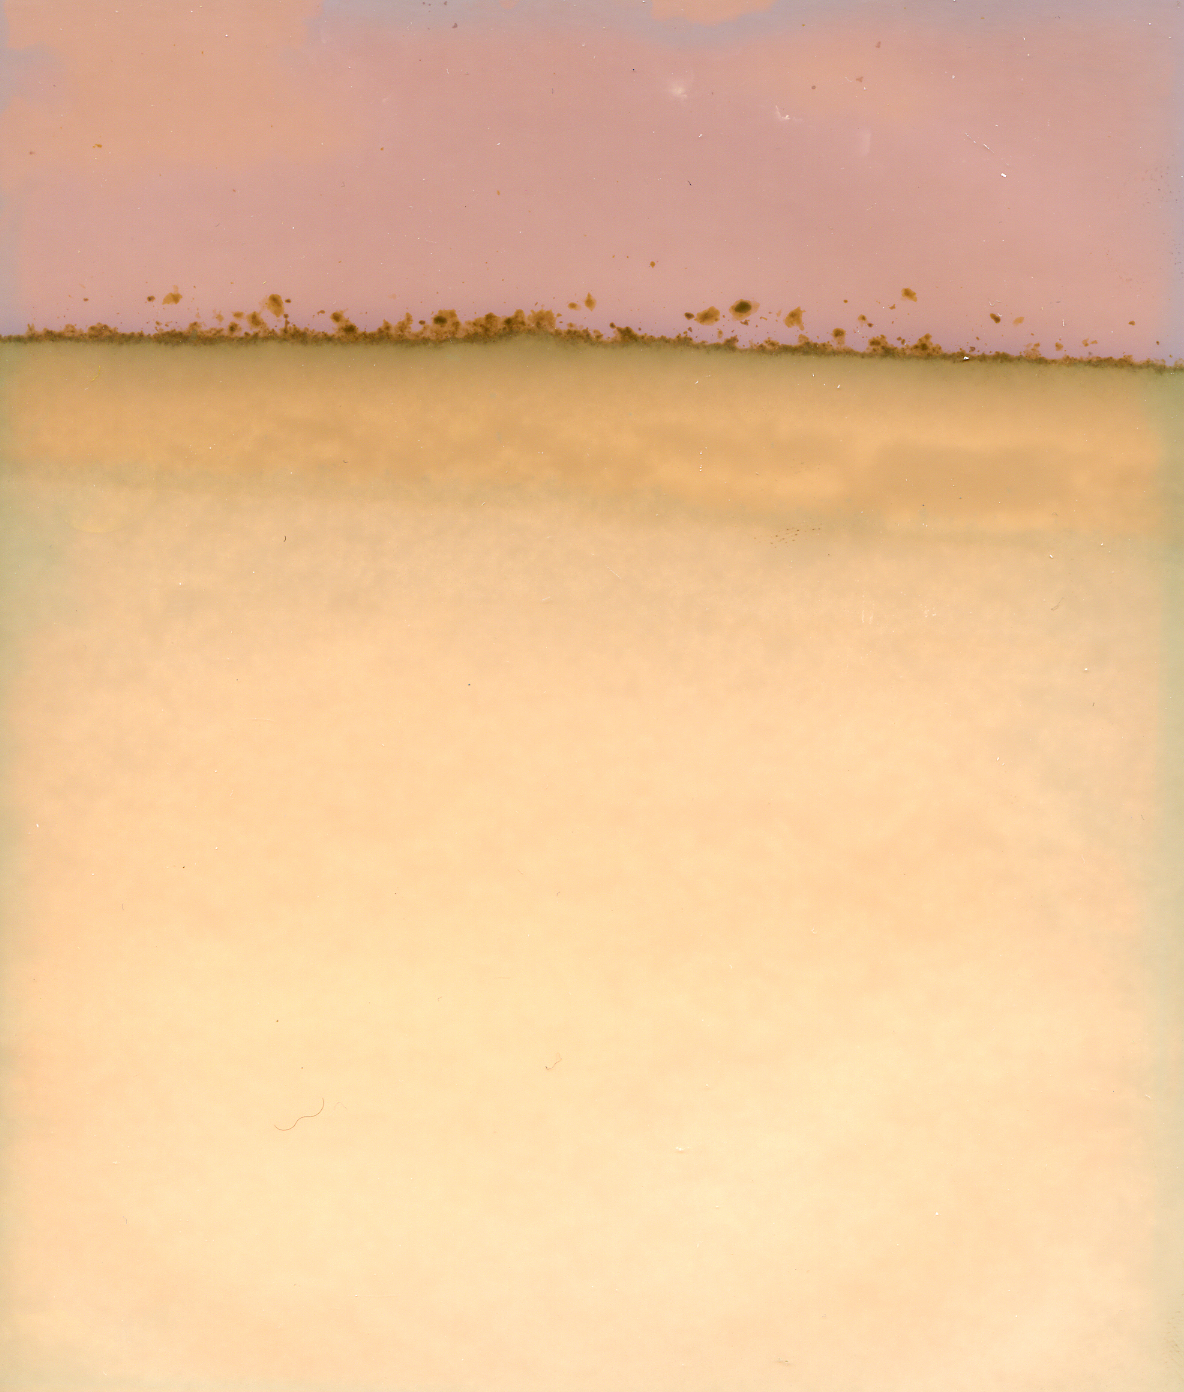 """Horizon and Storm/Drift Layers"" March 2018.  Sierra Crest (4x5 Lumen Print)"